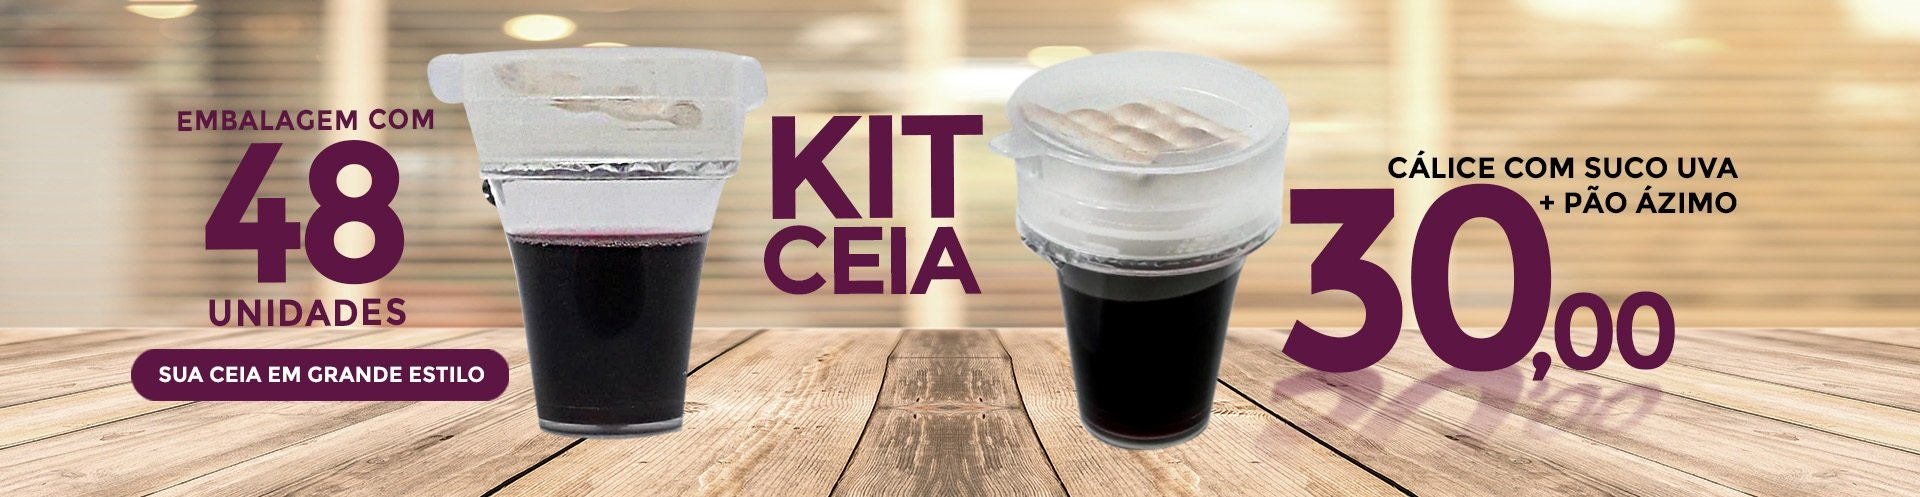 Kit Ceia - Suco + Pão Ázimo